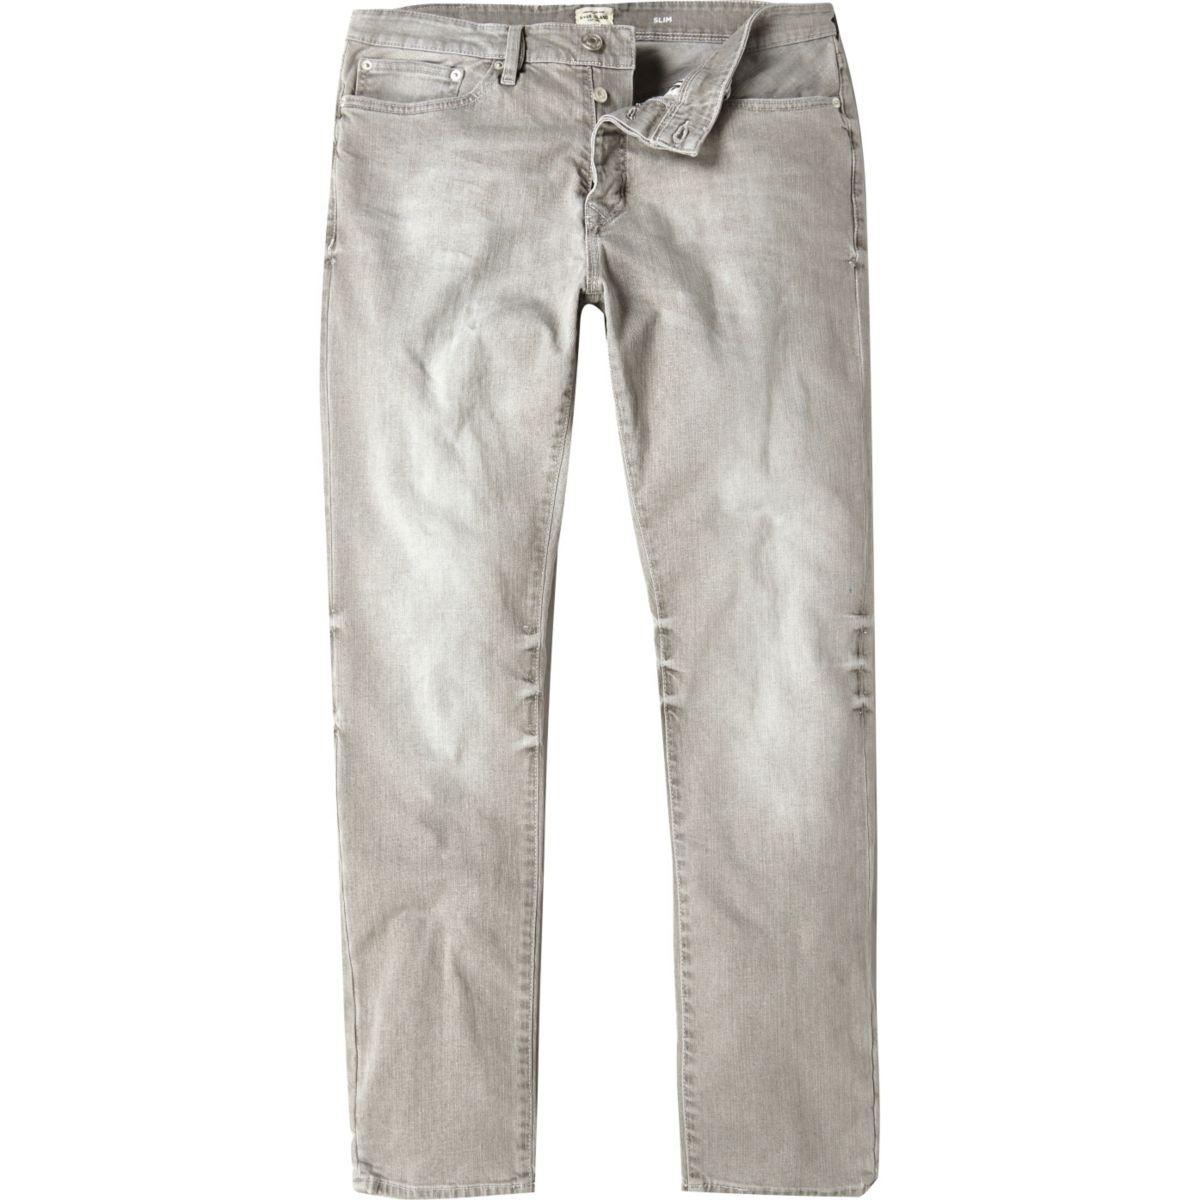 Worn grey Dylan slim fit jeans